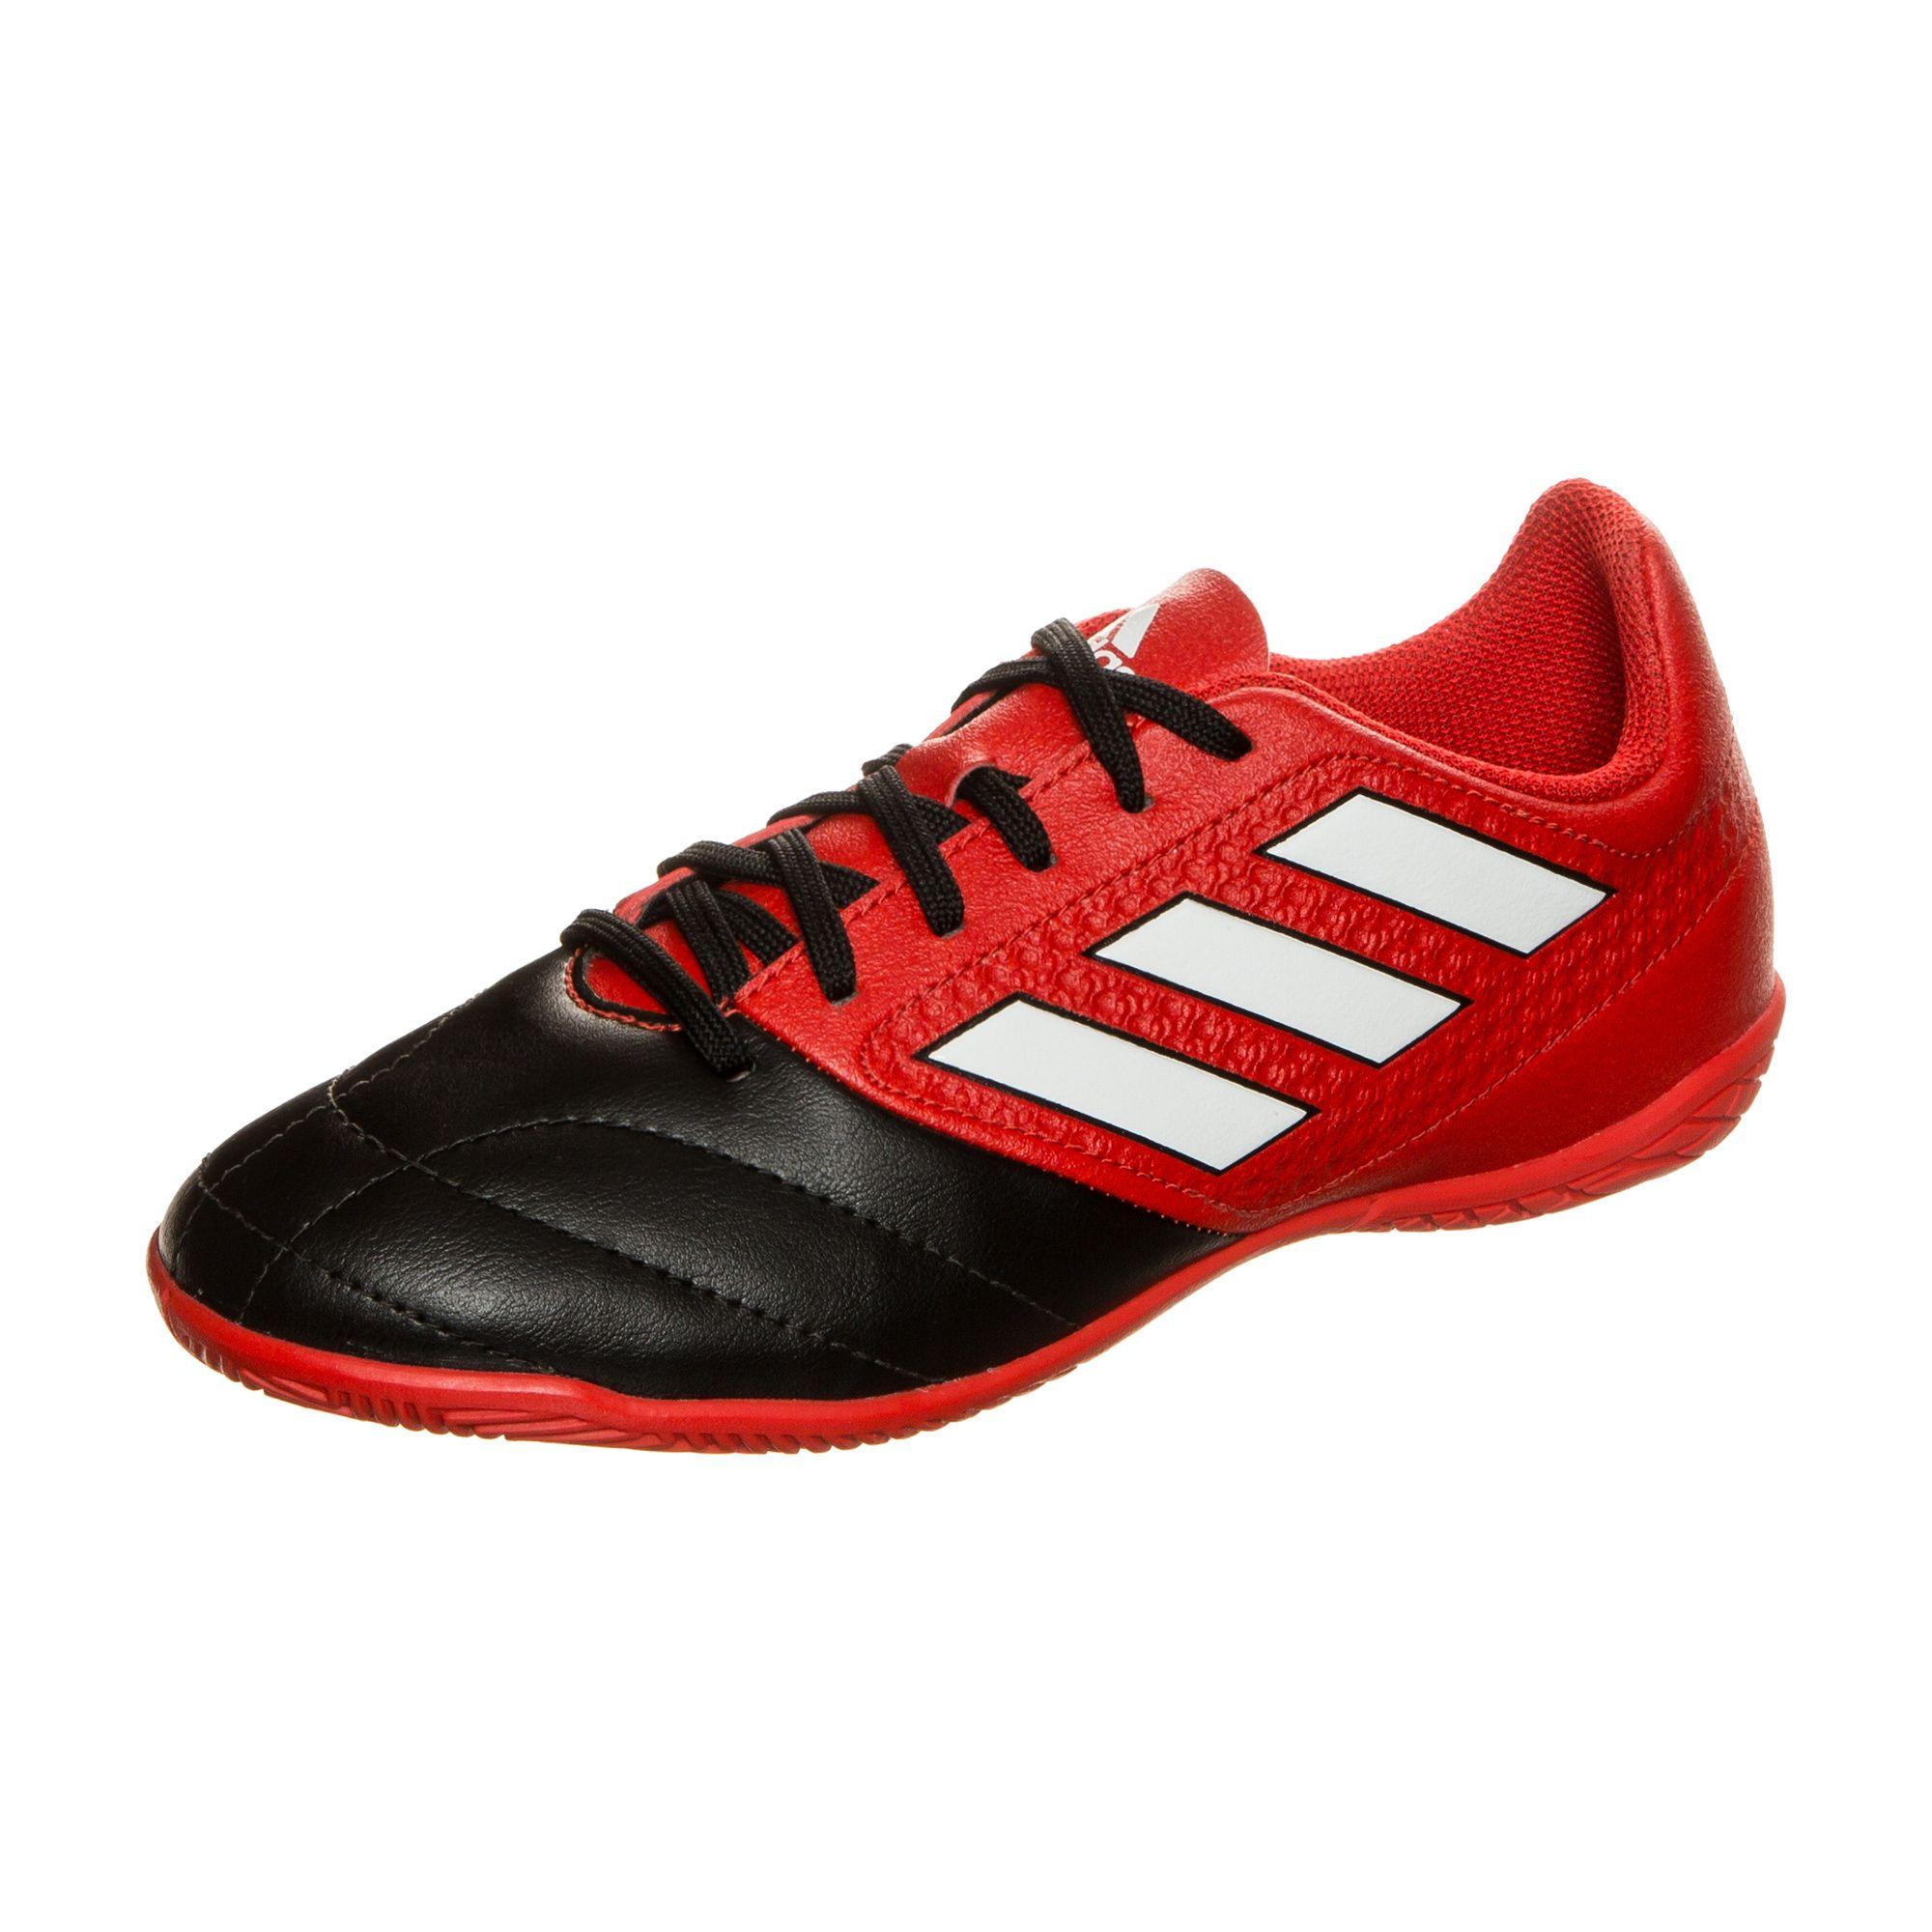 ADIDAS PERFORMANCE adidas Performance ACE 17.4 Indoor Fußballschuh Kinder